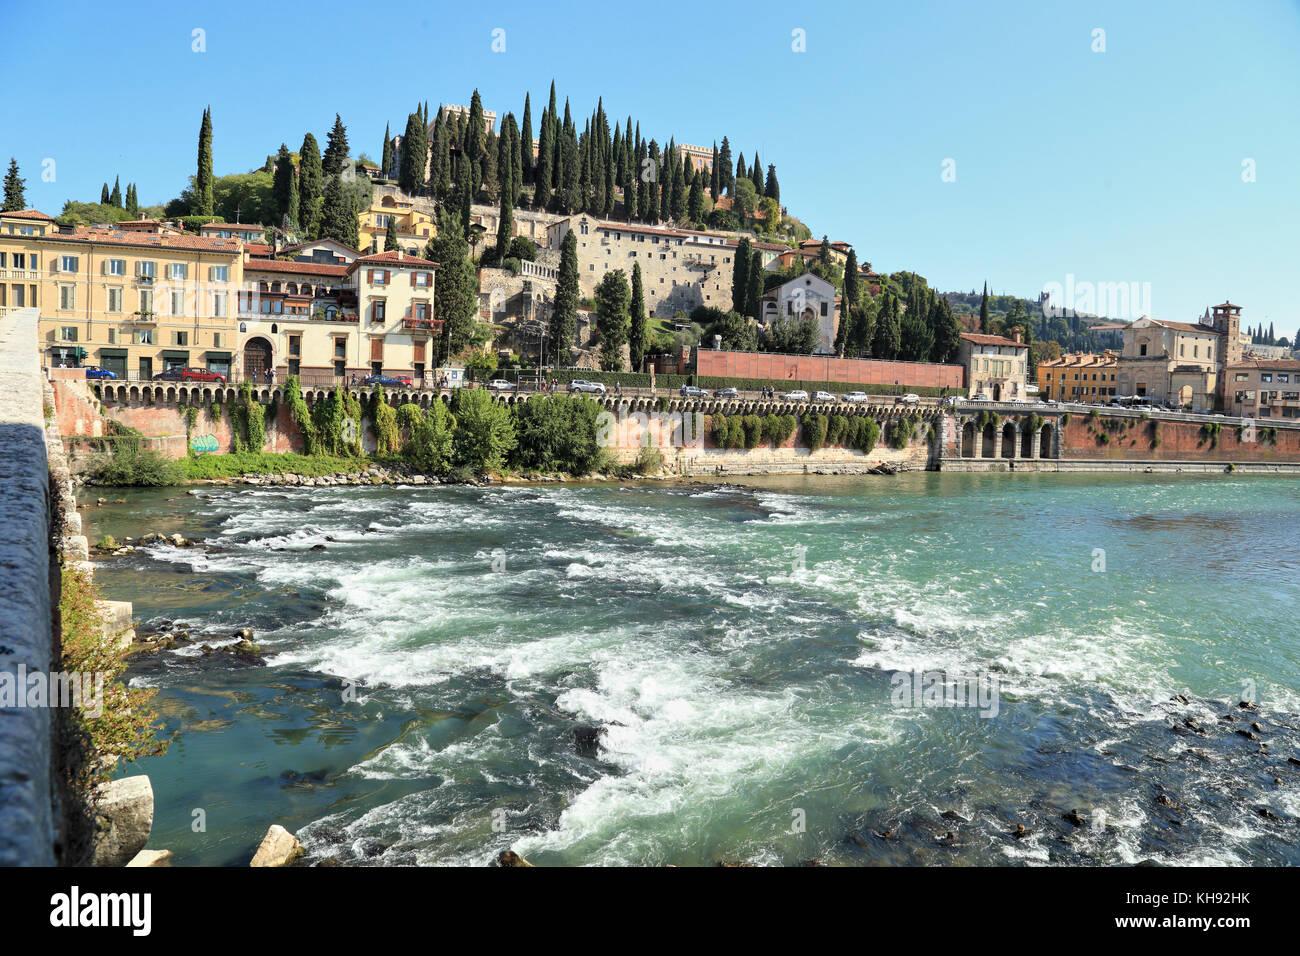 River Adige, Castel San Pietro, Verona. Saint Peter's Hill - Colle San Pietro - Stock Image